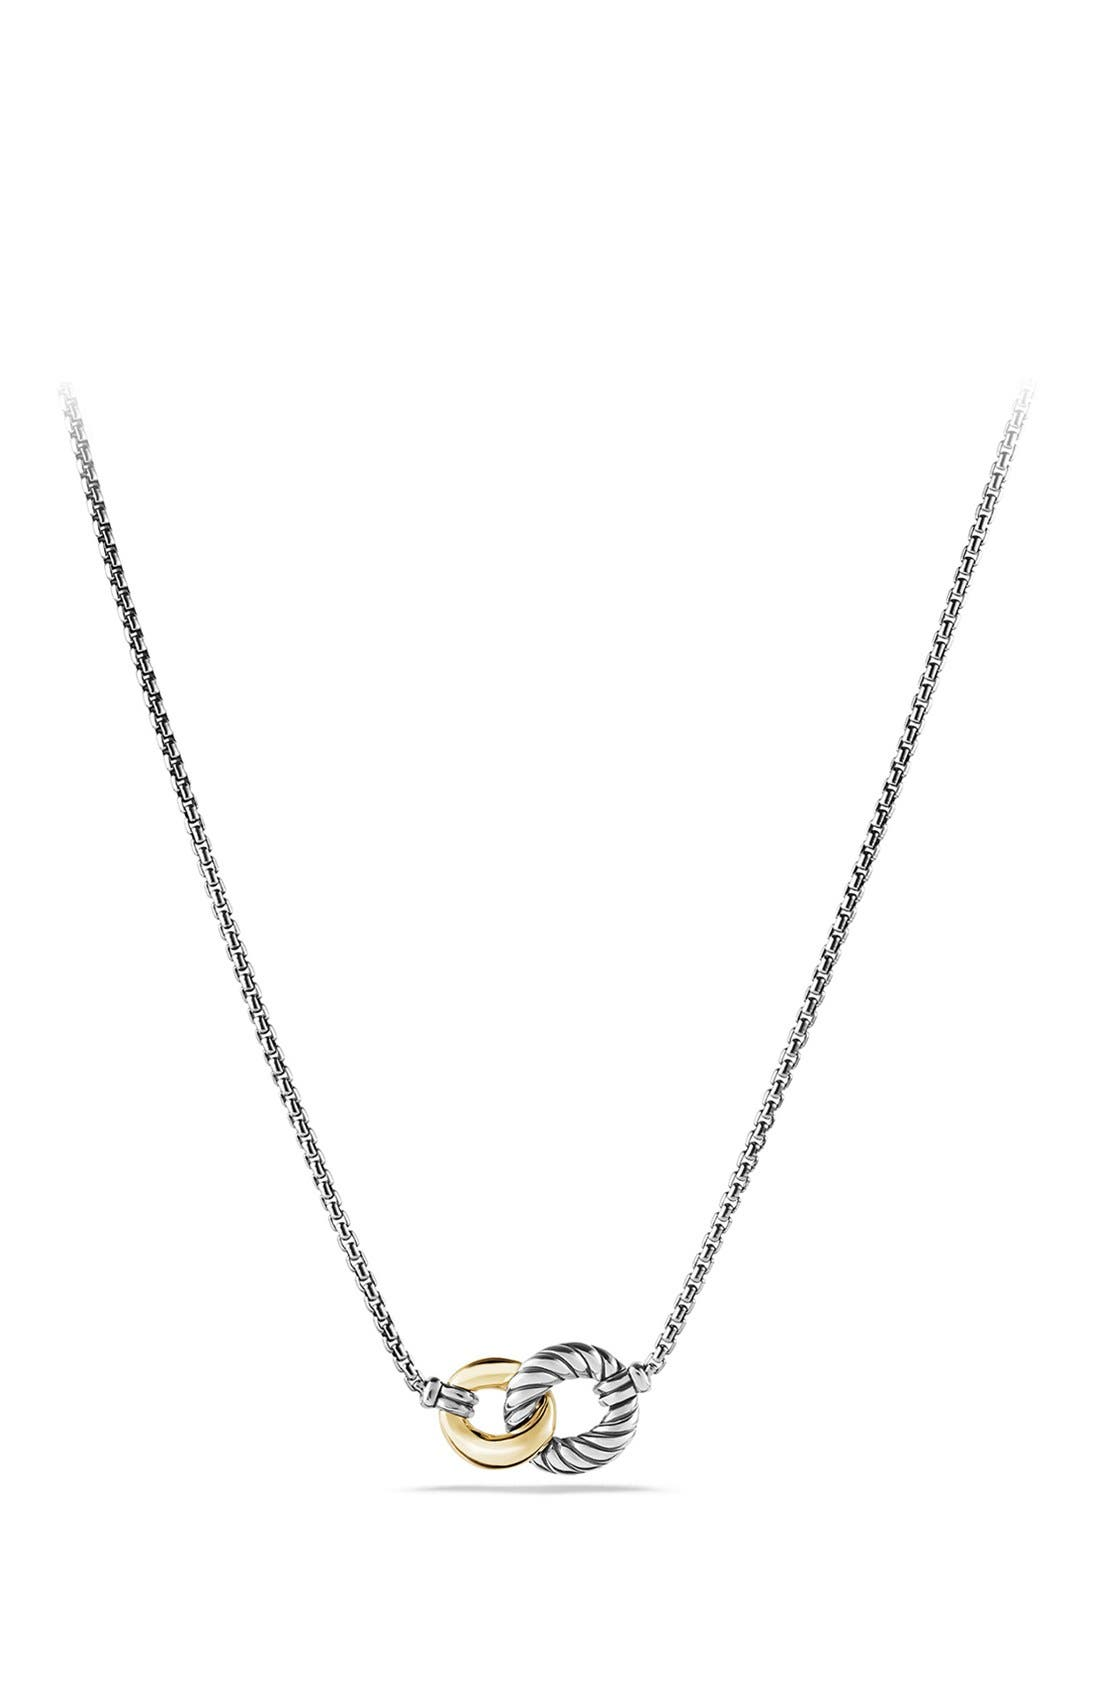 david yurman curb link necklace with